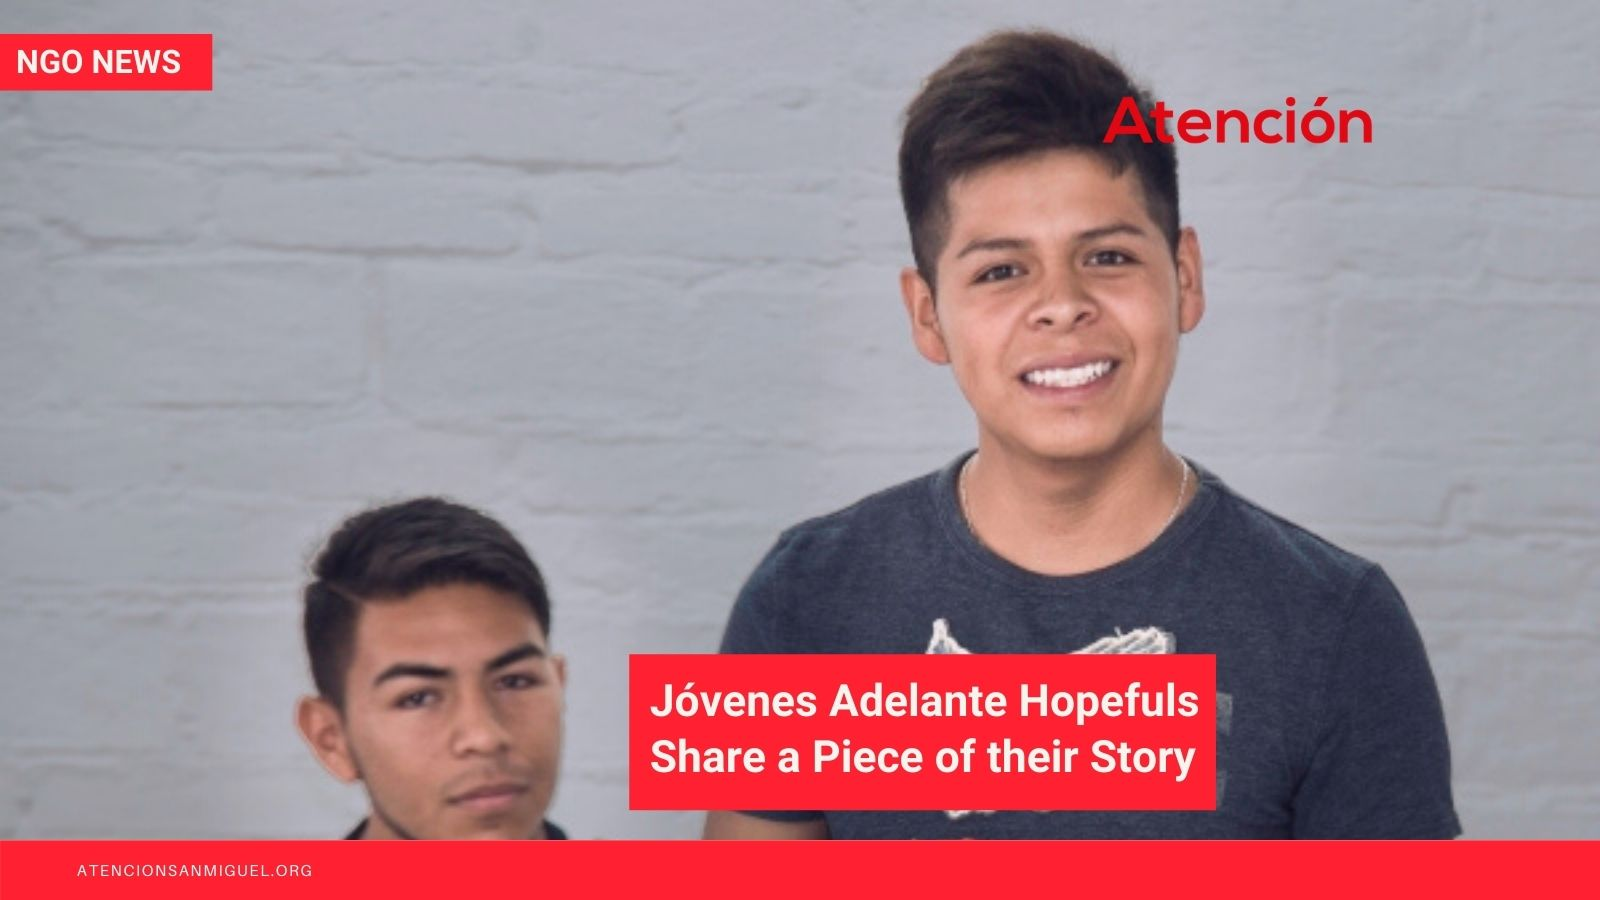 Jovenes-Adelante-Hopefuls-Share-a-Piece-of-their-Story.jpg